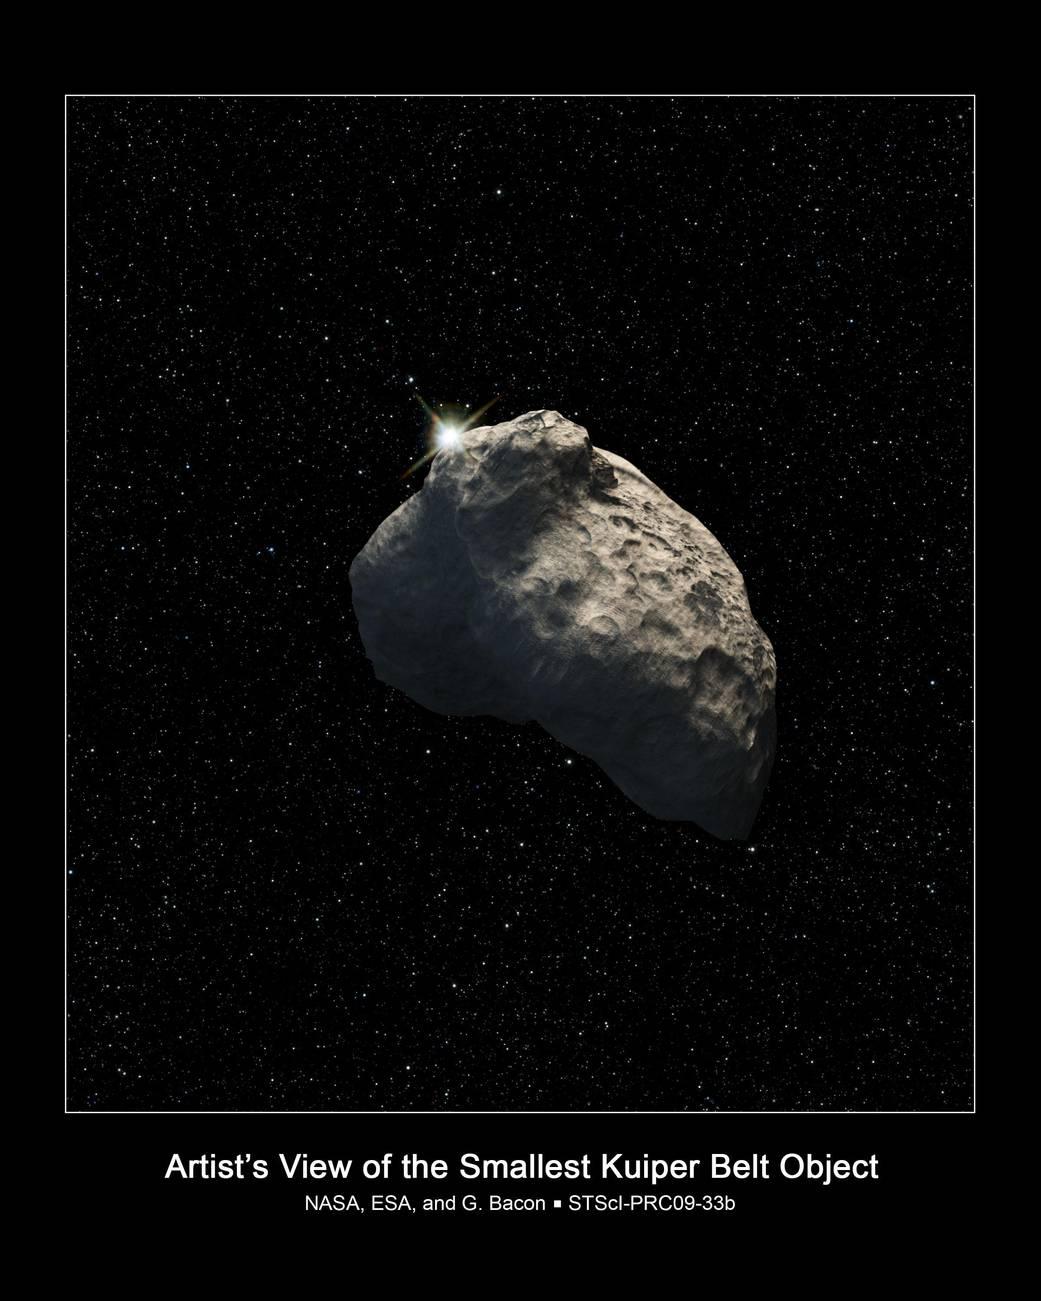 Hubble Finds Smallest Kuiper Belt Object